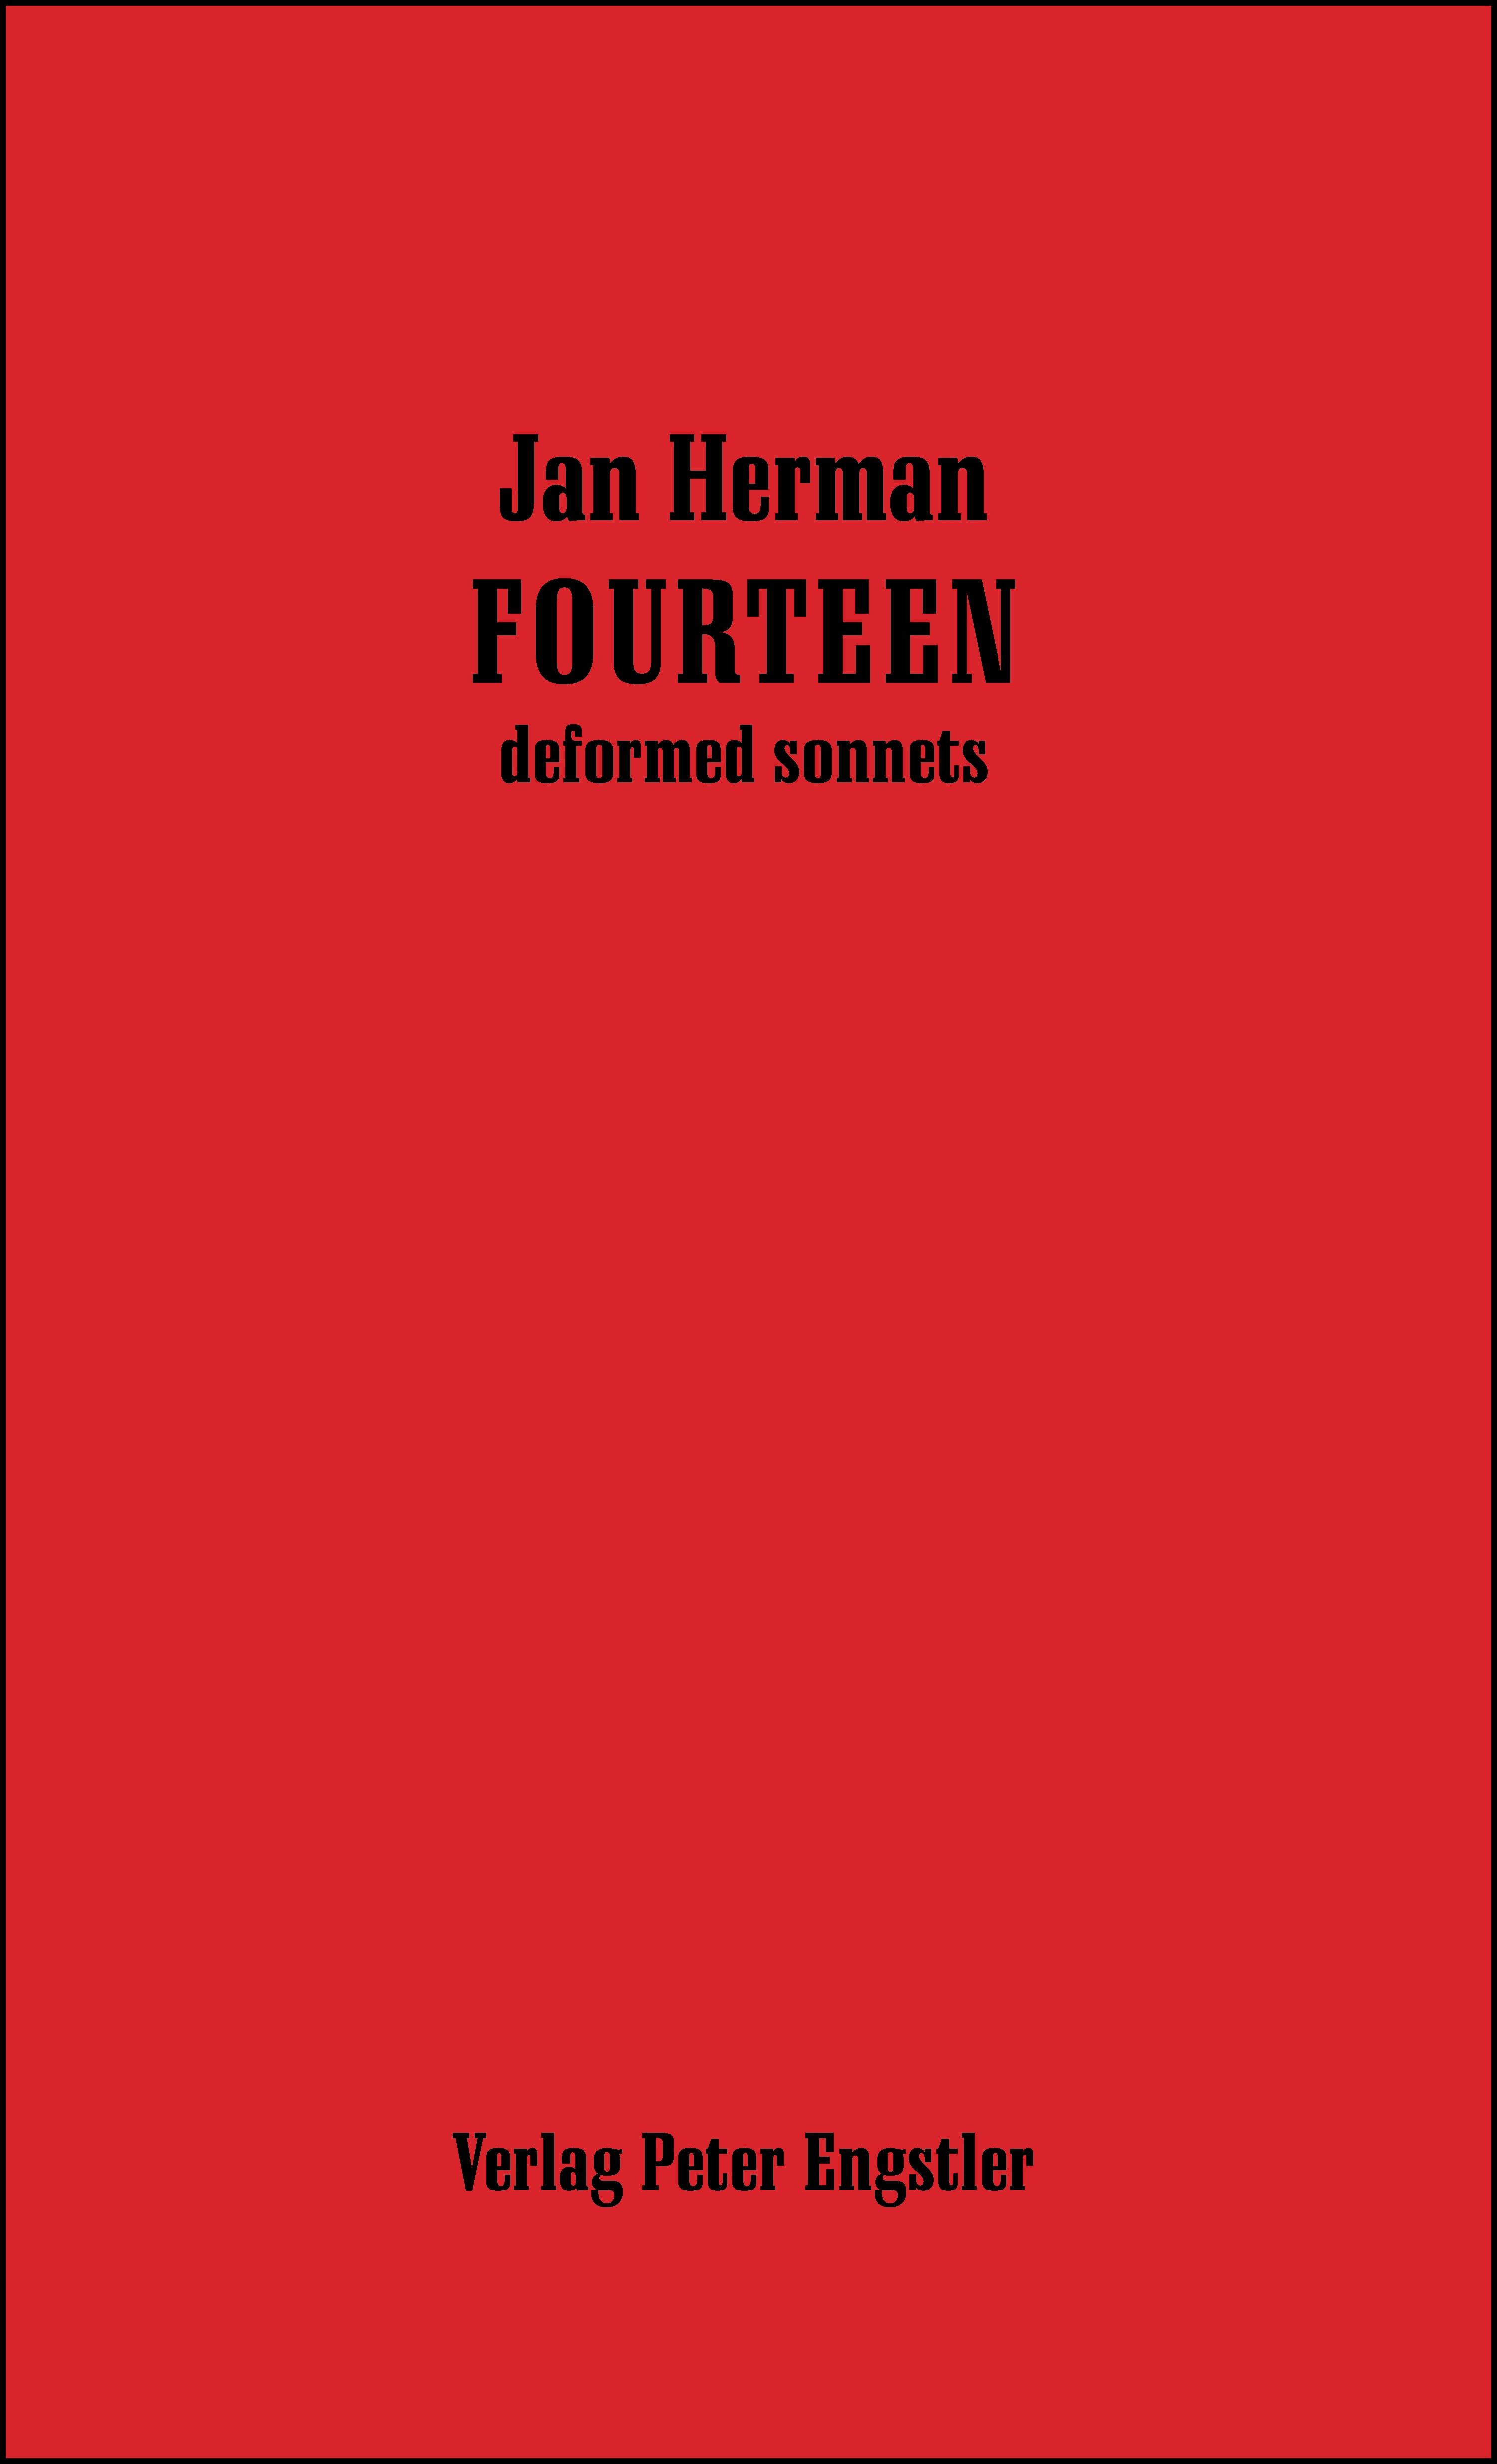 Herman, Jan : FOURTEEN deformed sonnets